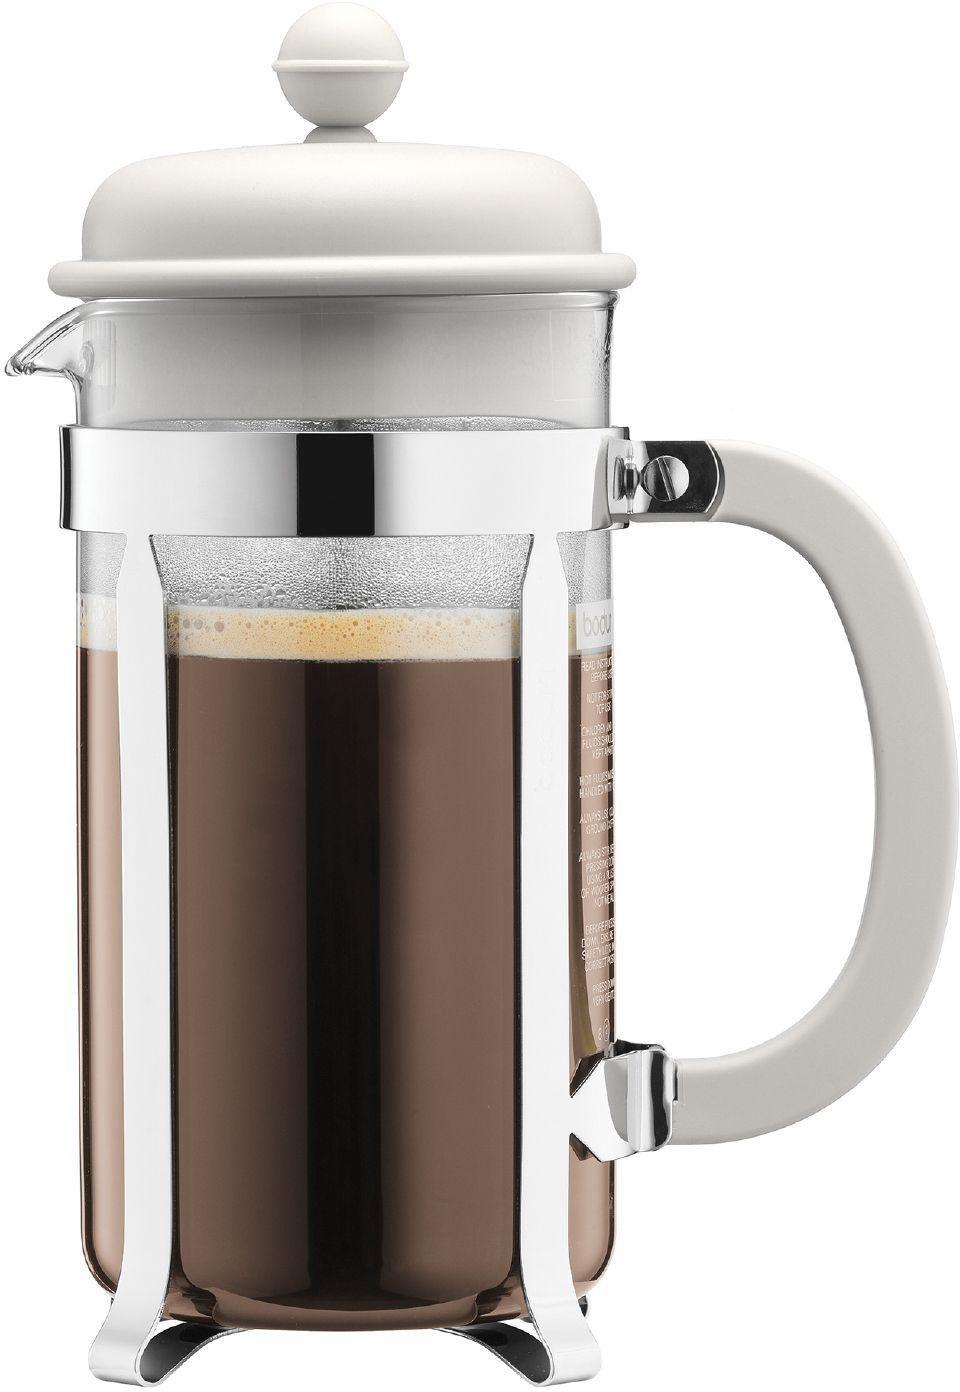 Image of Bodum - Caffettiera Coffee Maker 8 Cup - White